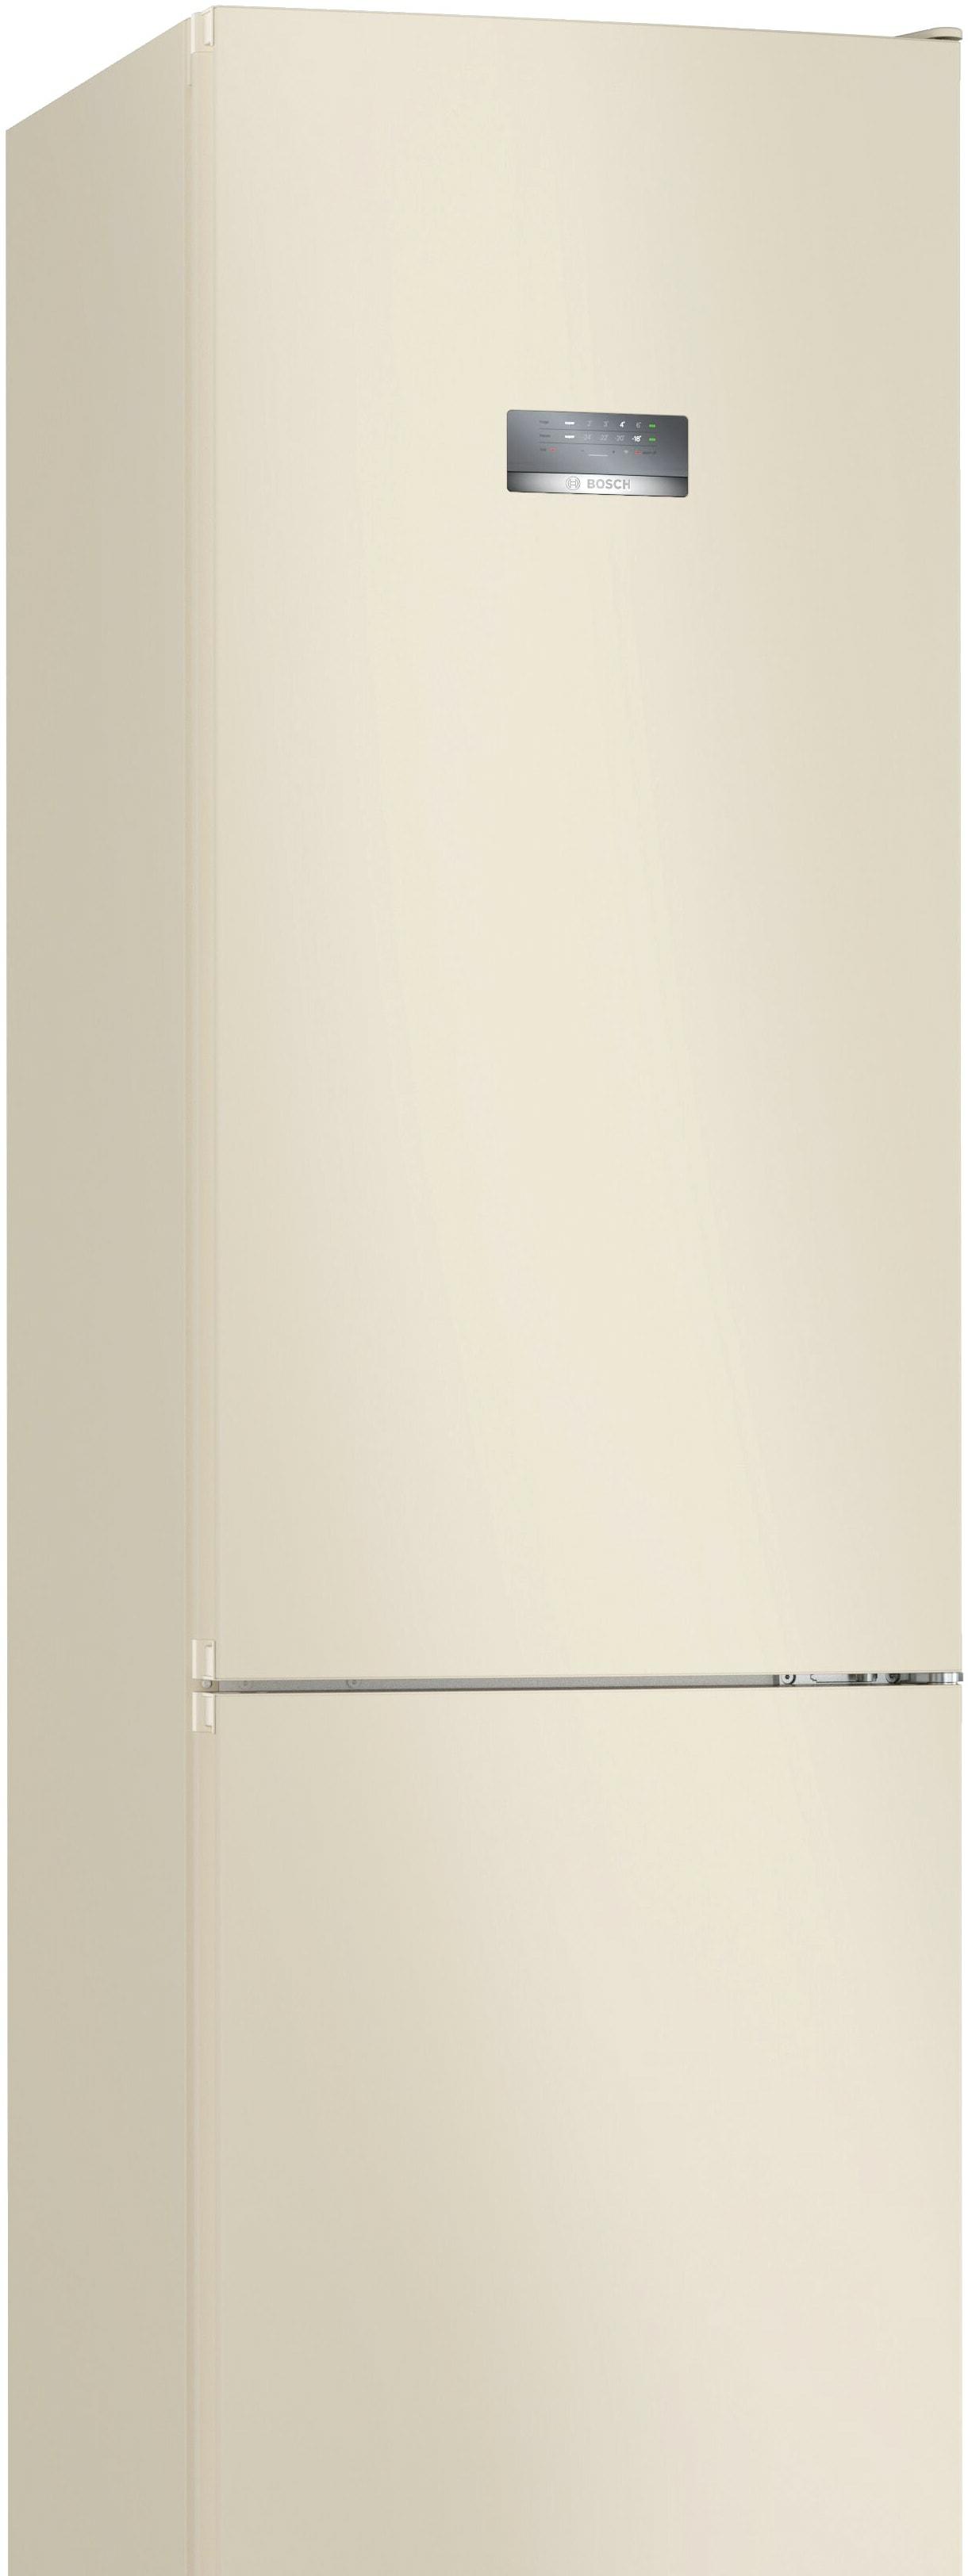 Холодильник Bosch Serie 4 VitaFresh KGN39VK24R